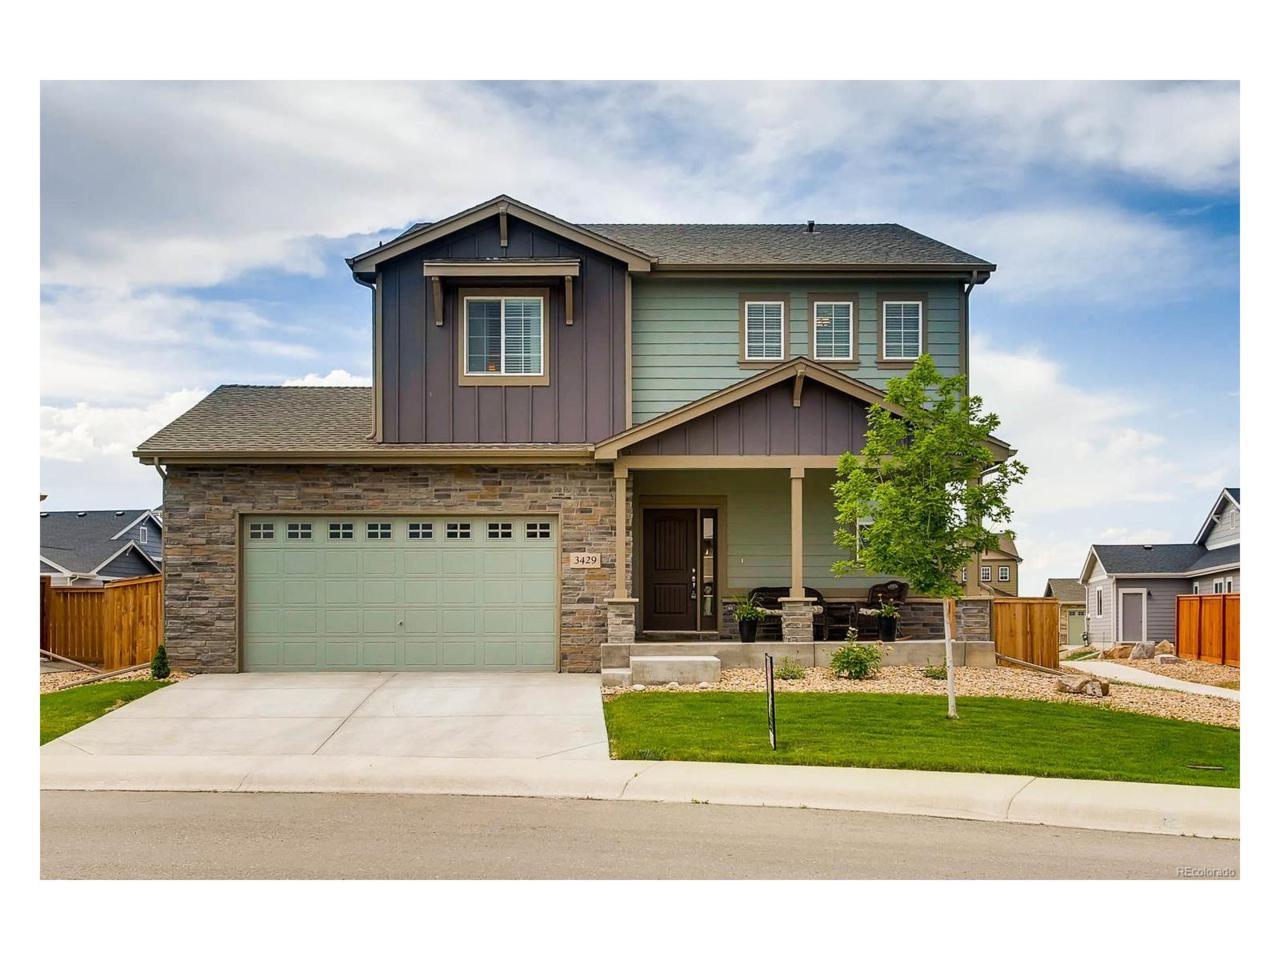 3429 Janus Drive, Loveland, CO 80537 (MLS #5100407) :: 8z Real Estate